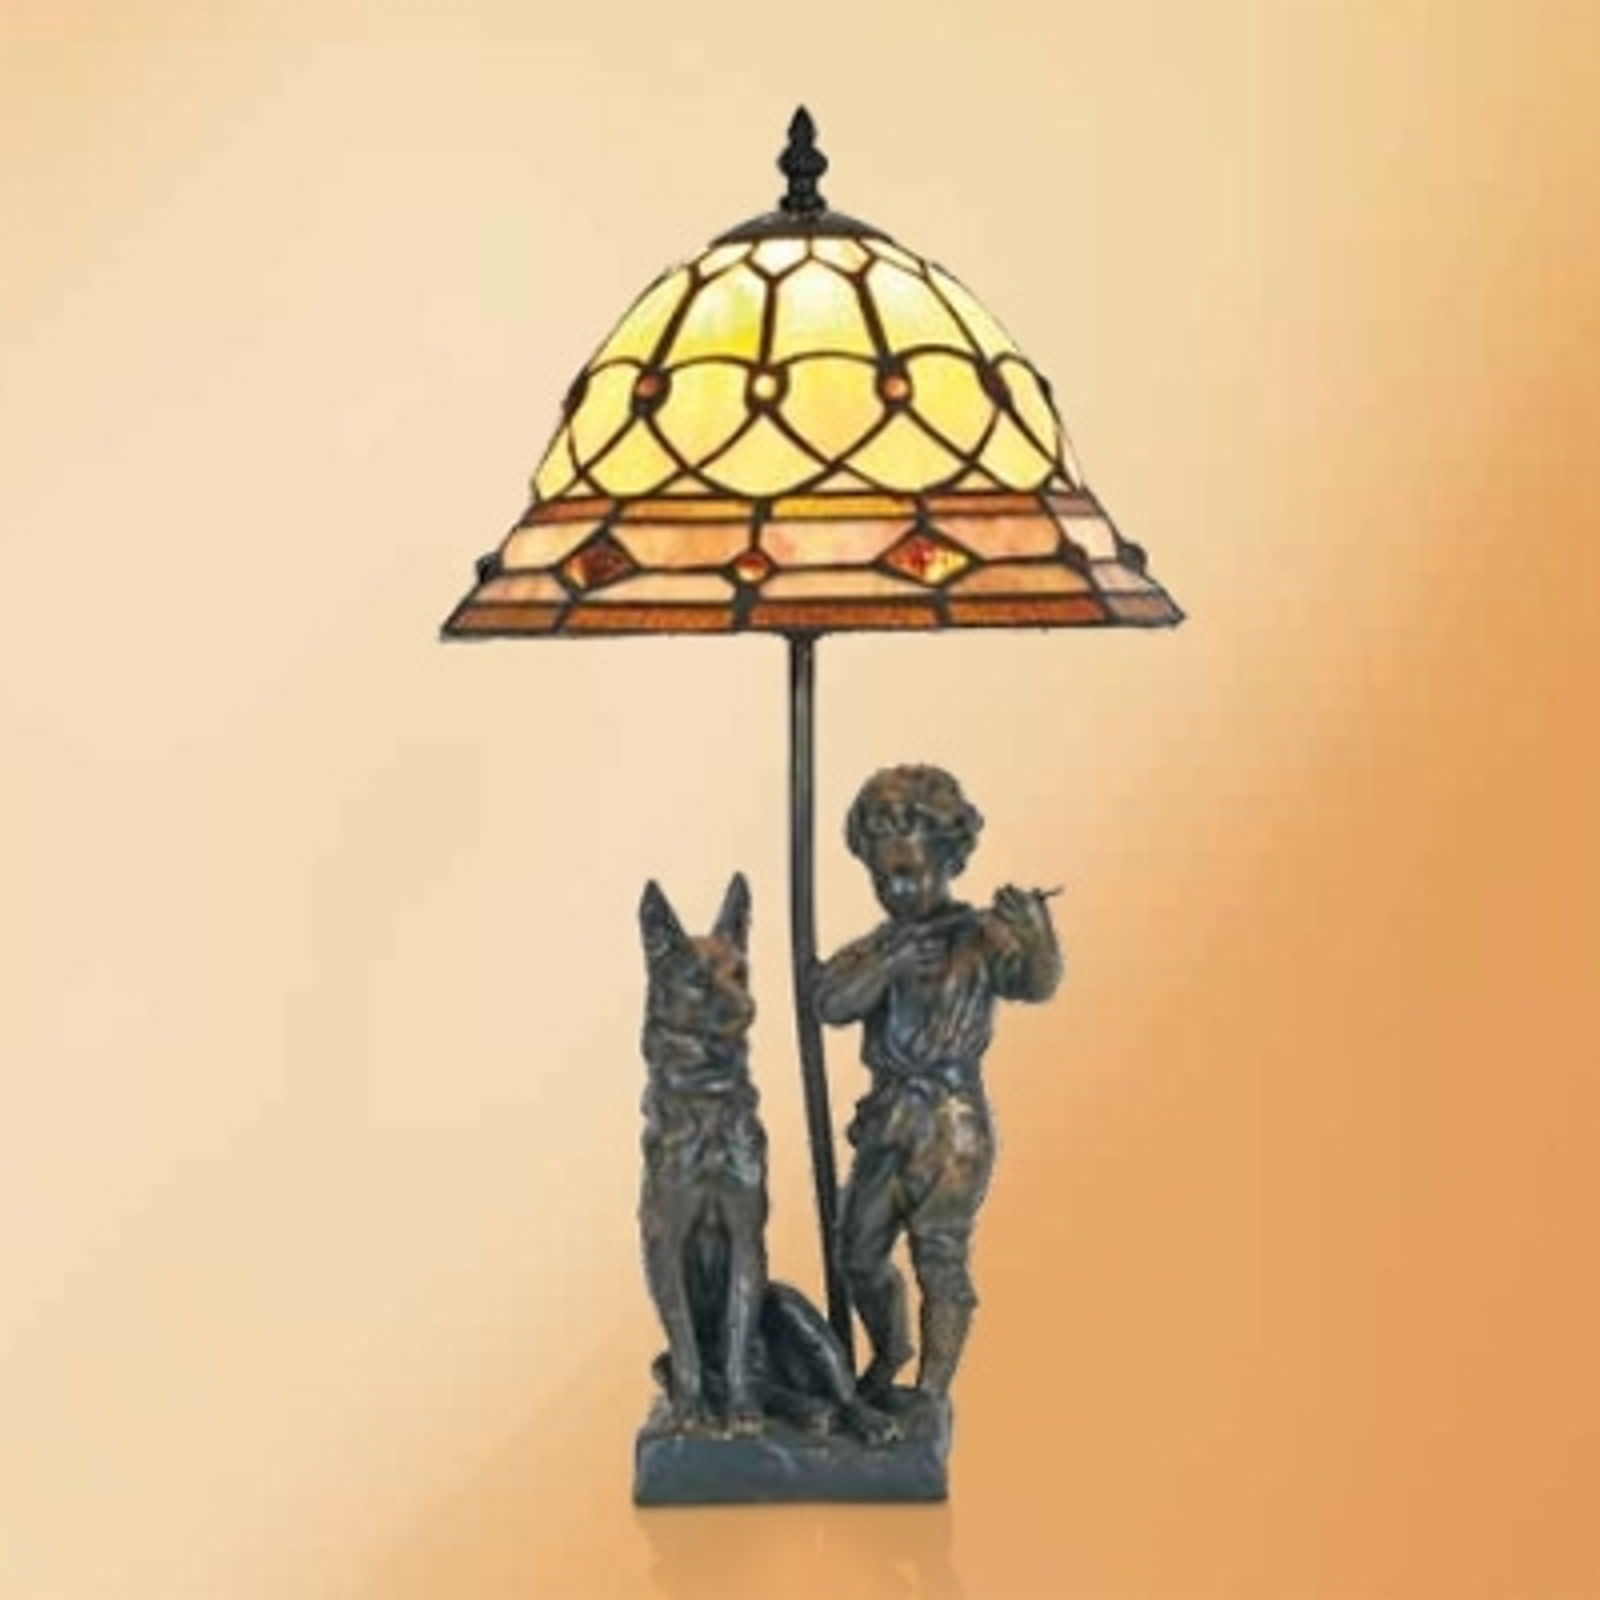 Hugo - bordslampa med hartsfigurer, tiffanystil